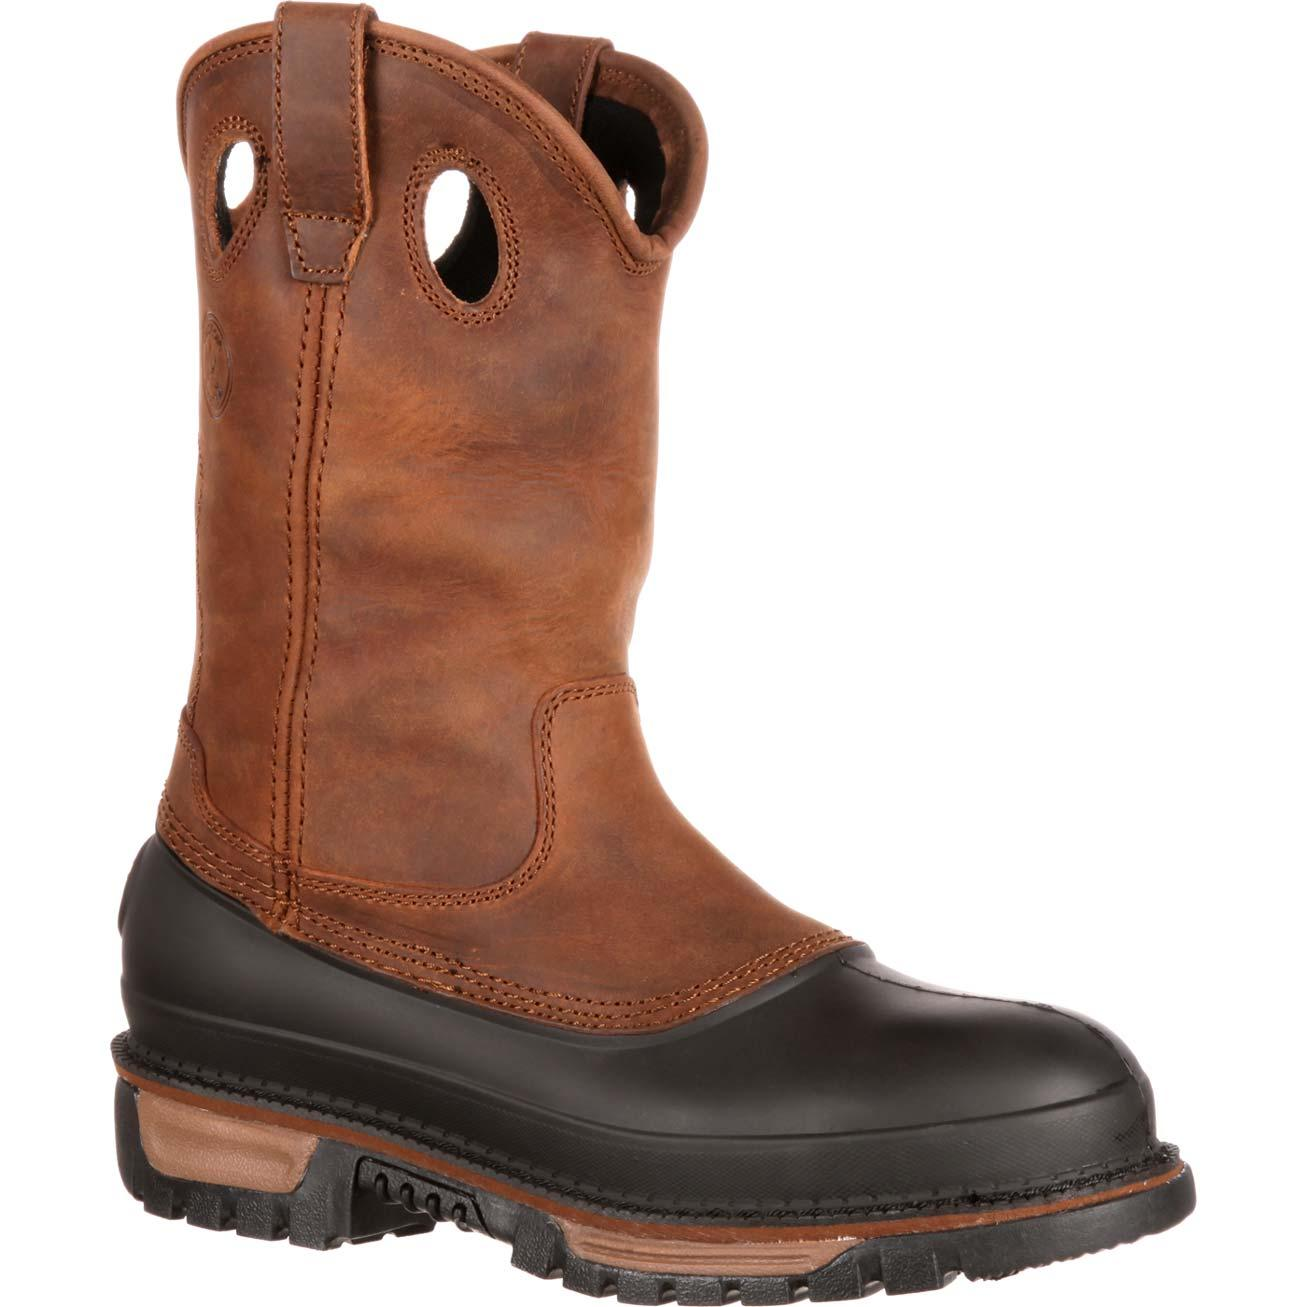 wellingtons boots georgia boot muddog steel toe waterproof wellington, , large PFJQMRB